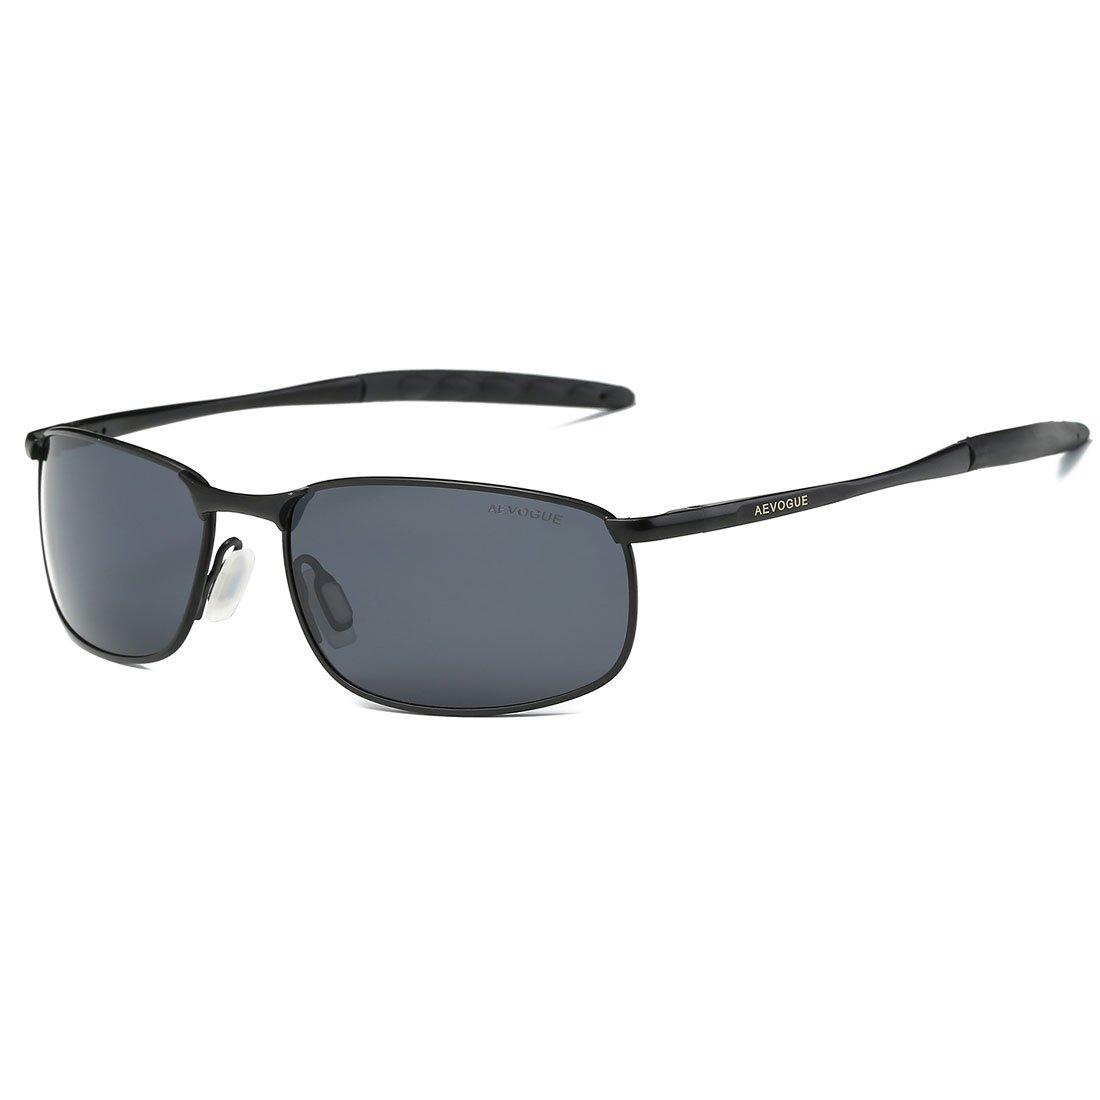 a9100255ac9 Amazon.com  AEVOGUE Polarized Sunglasses For Men Rectangle Metal Frame  Retro Sun Glasses AE0395 (Black